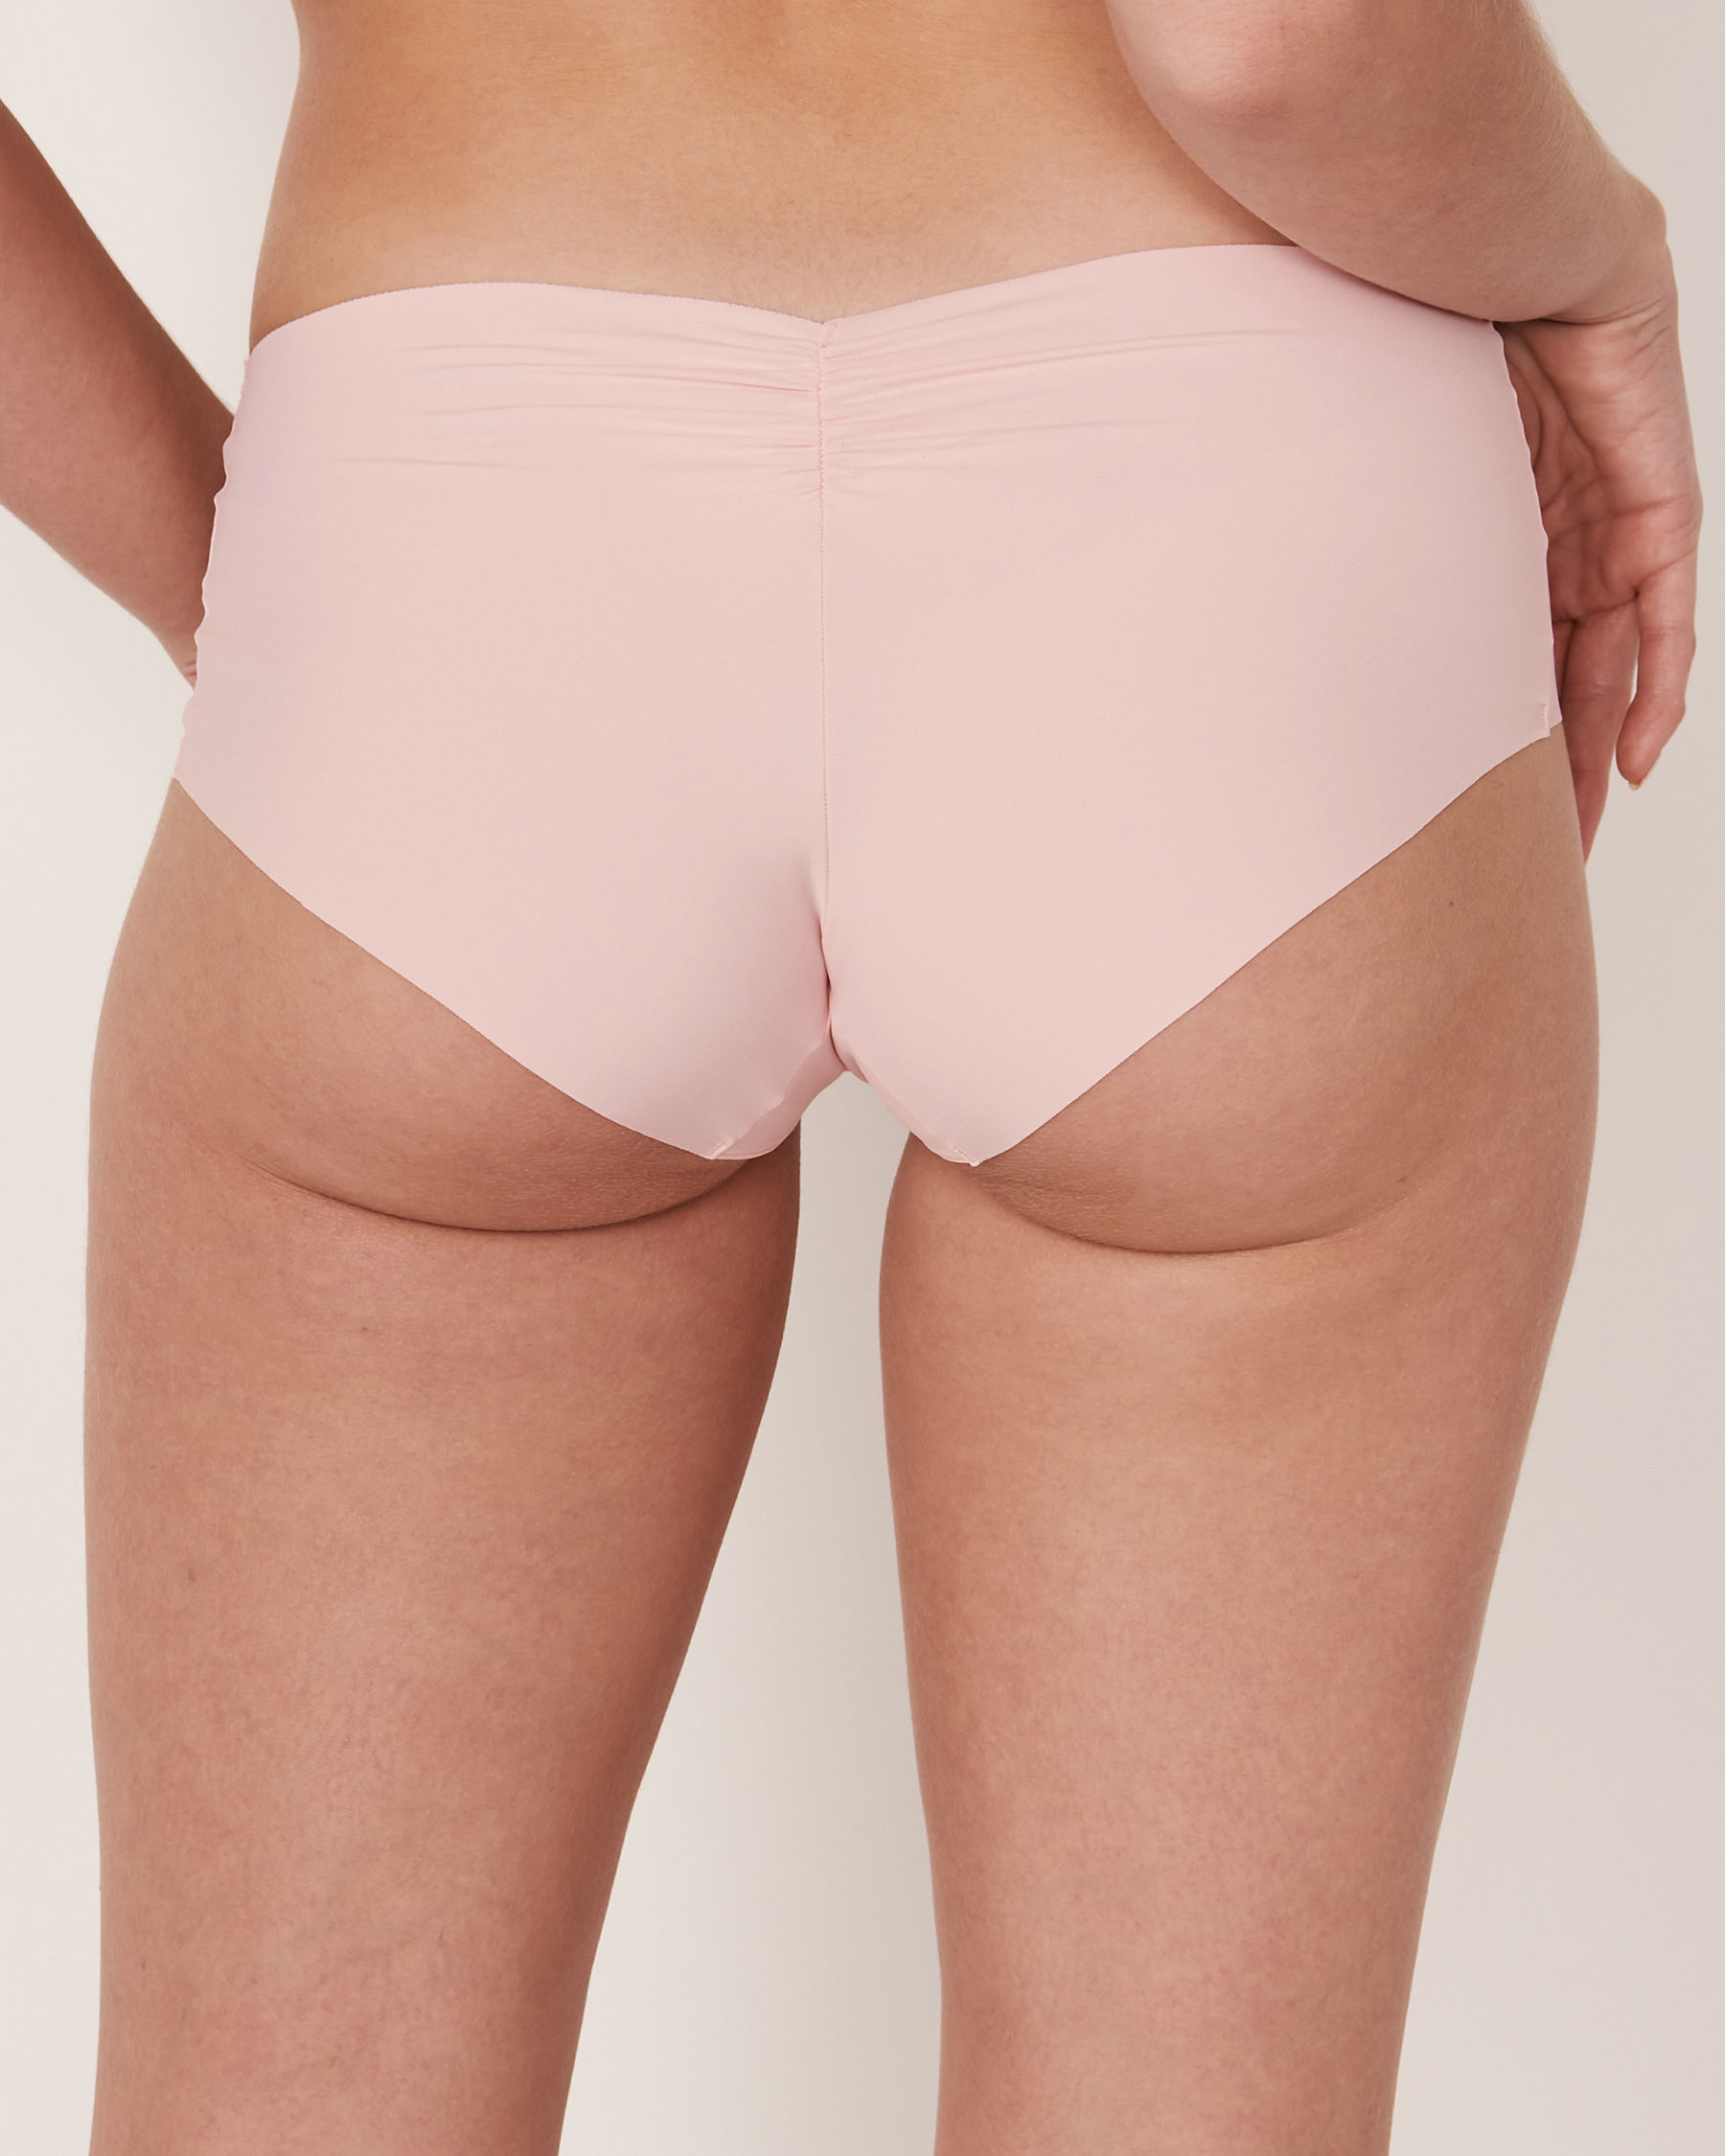 LA VIE EN ROSE Seamless Hiphugger Panty Light pink 20200048 - View2